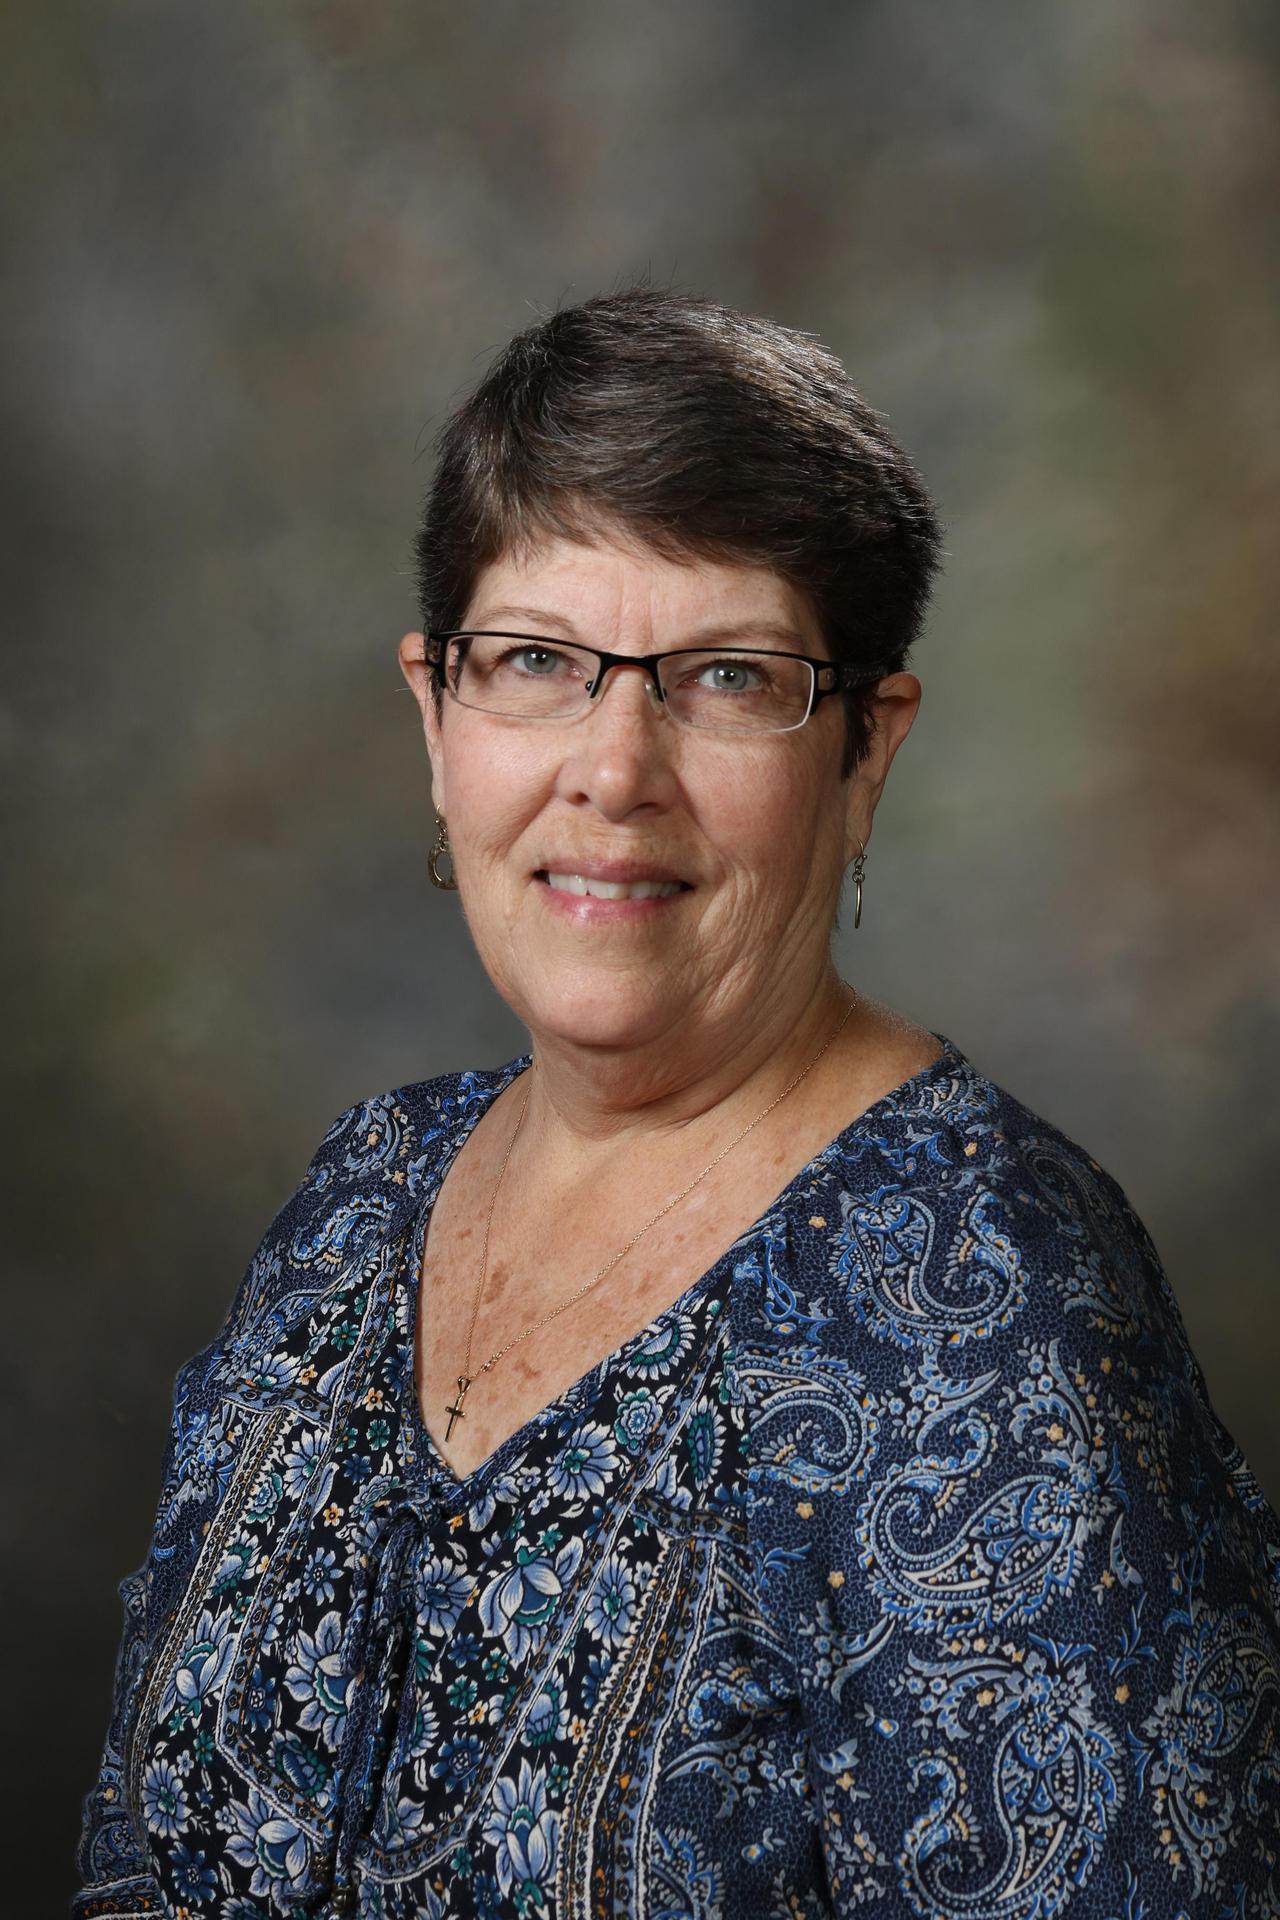 Ms. Mills